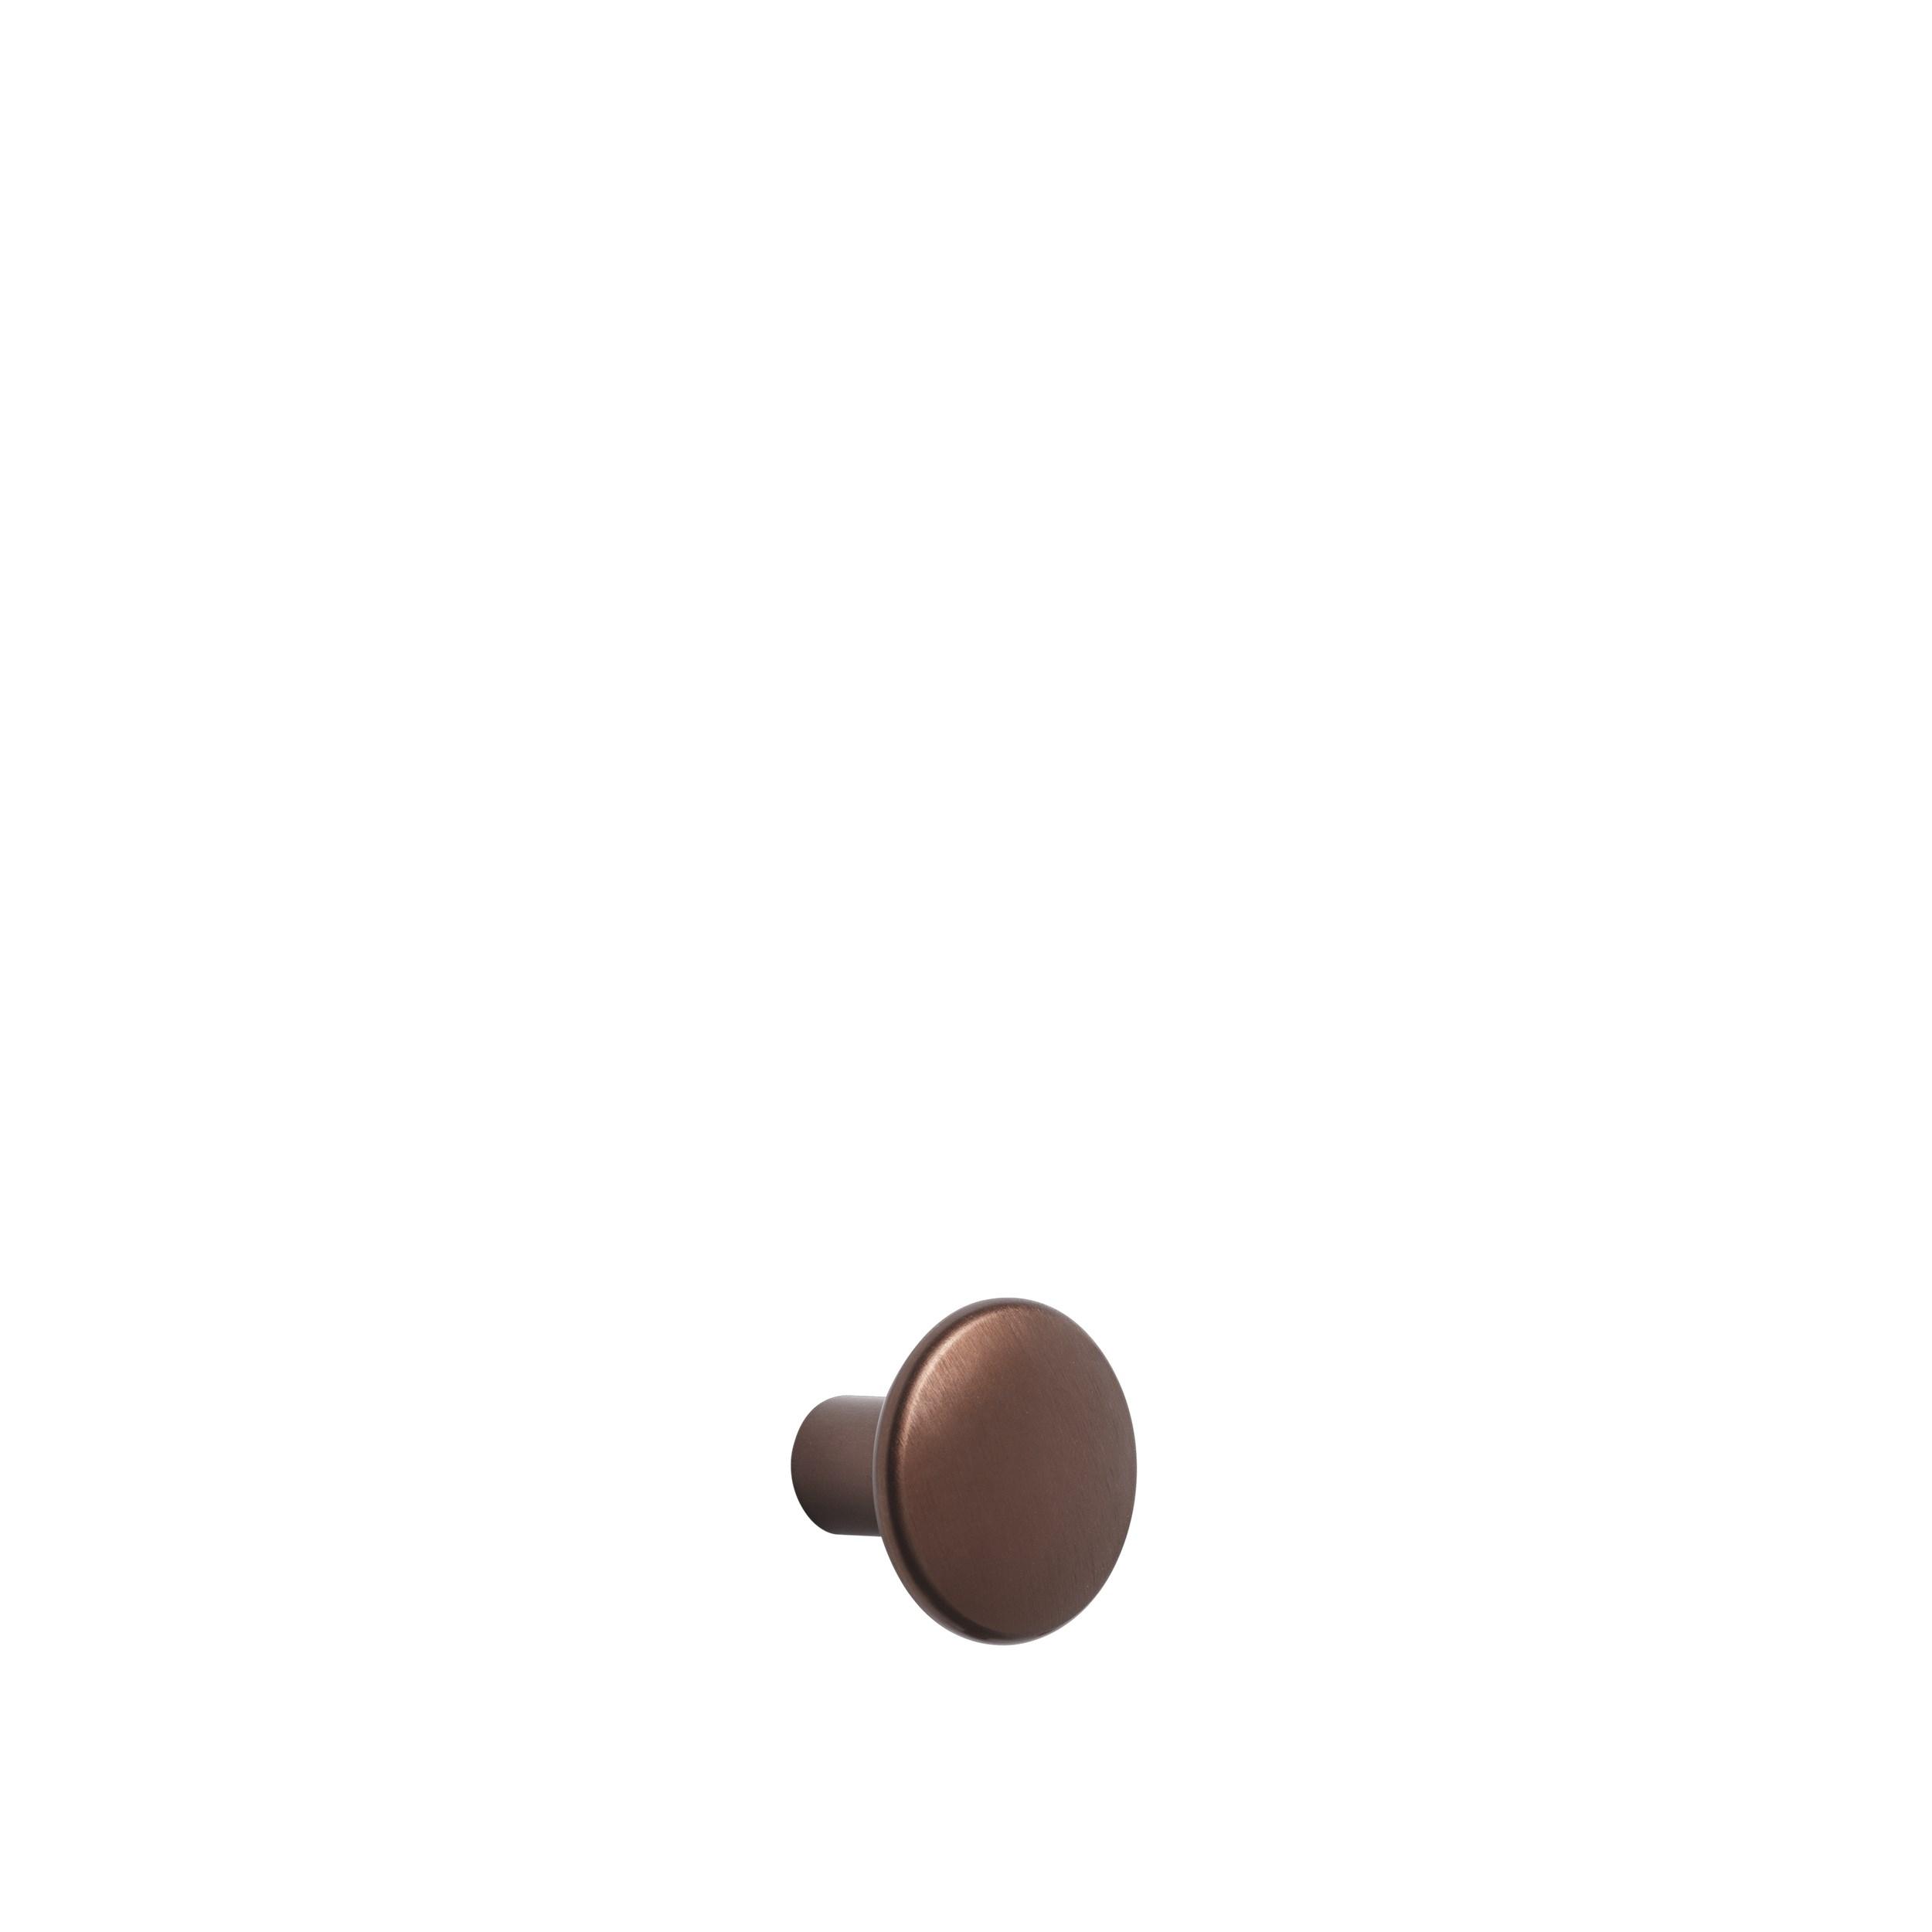 Dots metal small Ø 2,7 cm umber